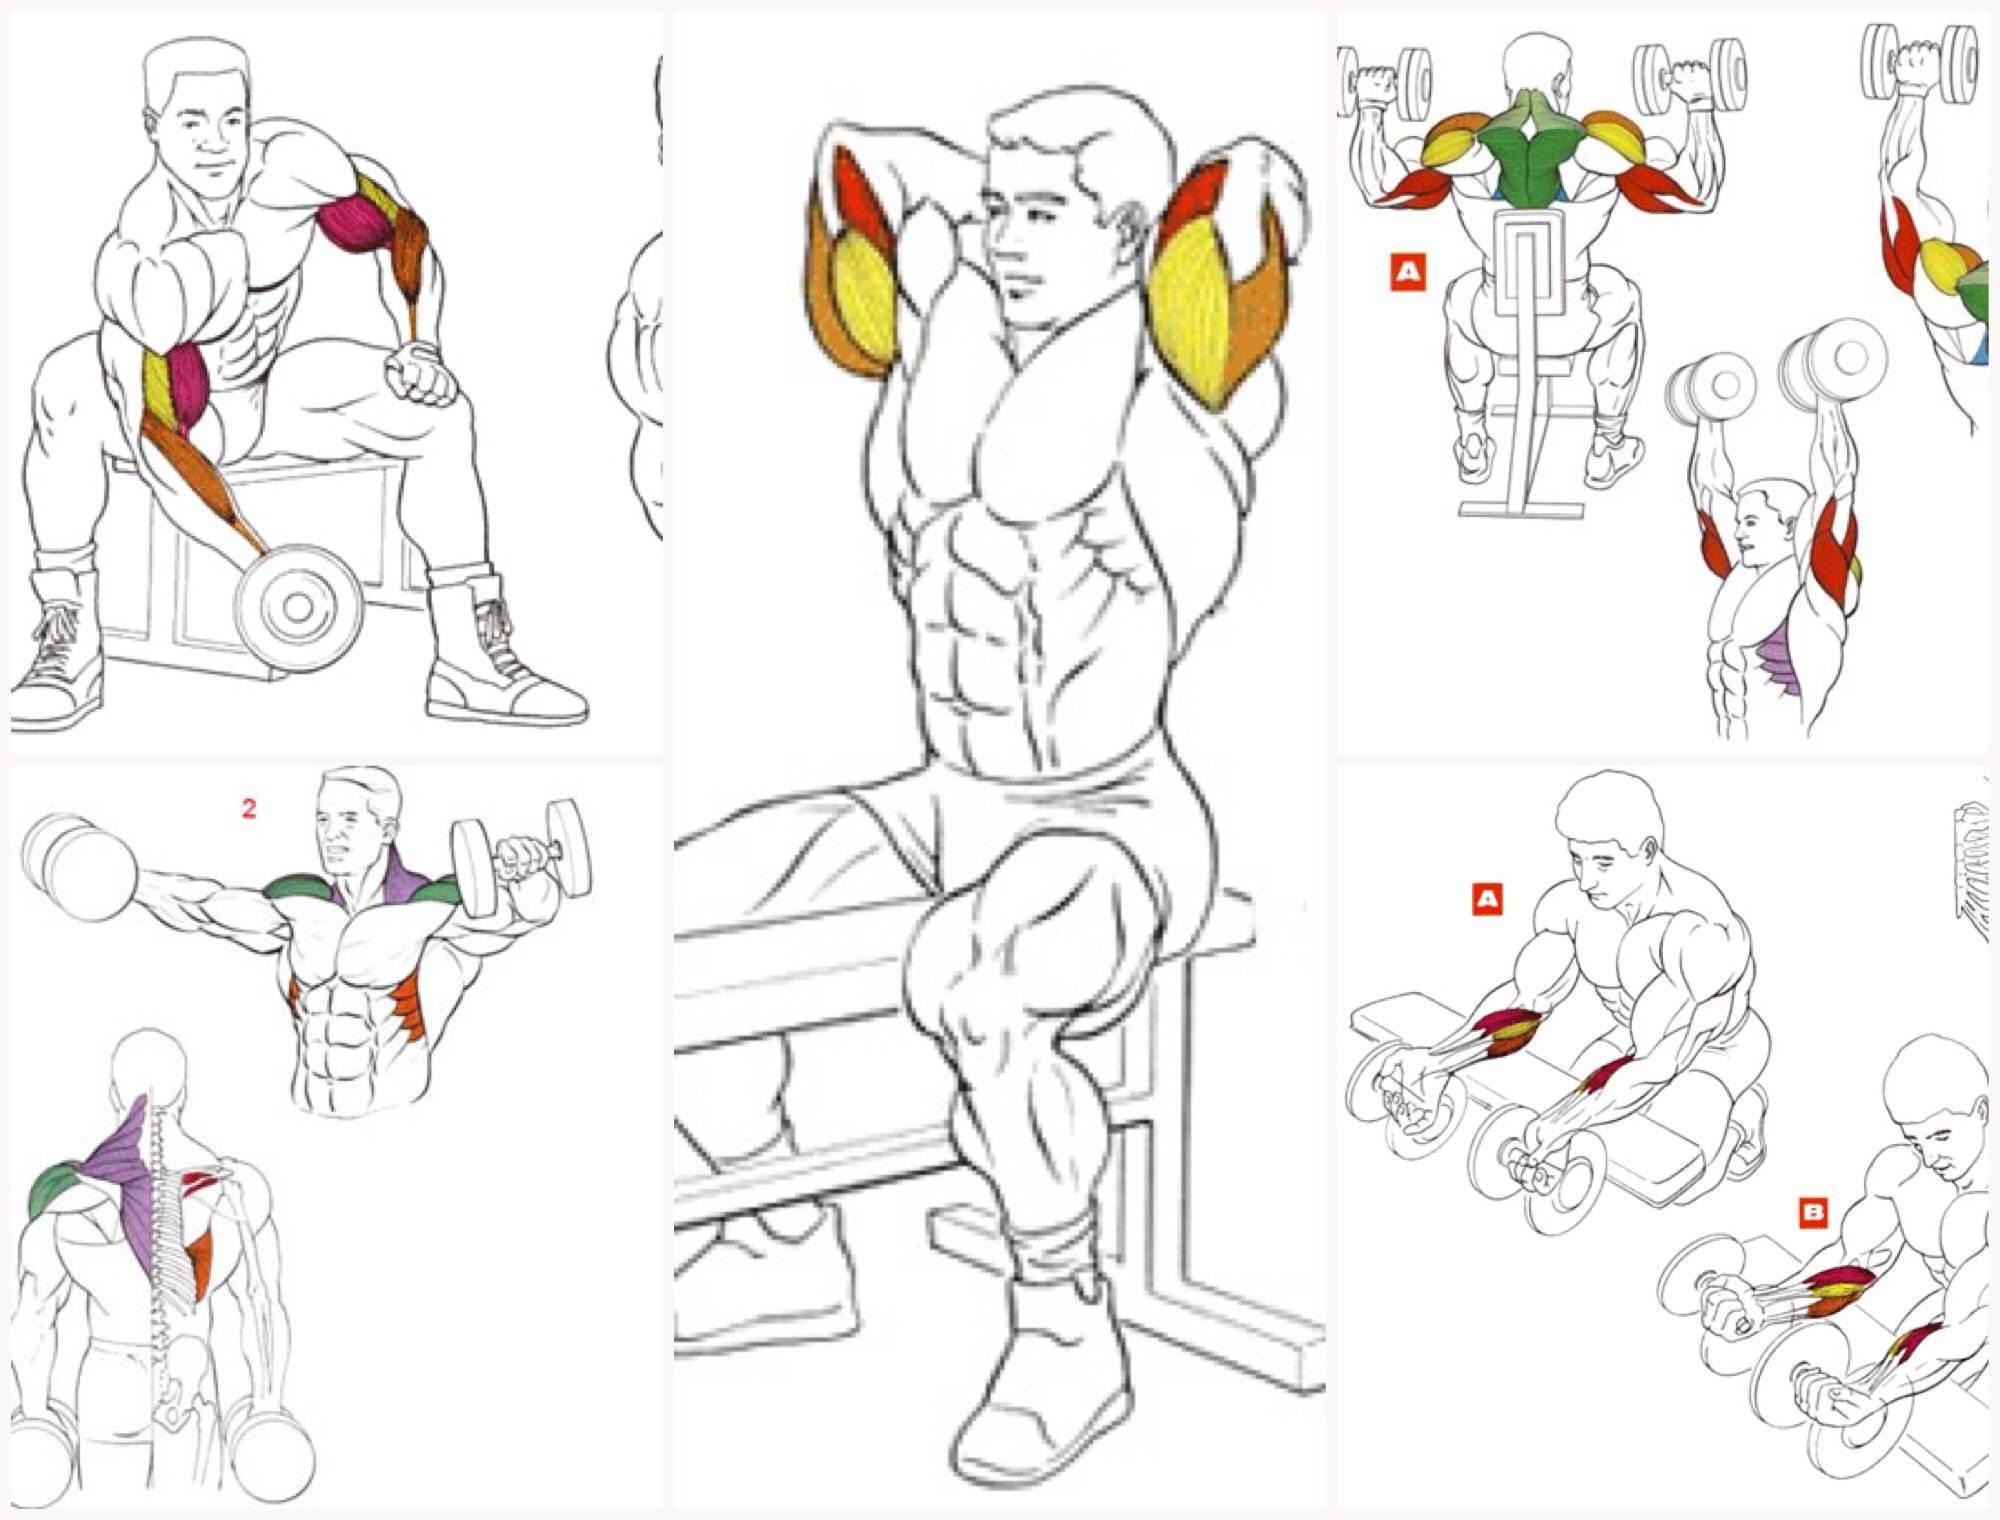 Как быстро накачать бицепс? правила тренировки мышц бицепса